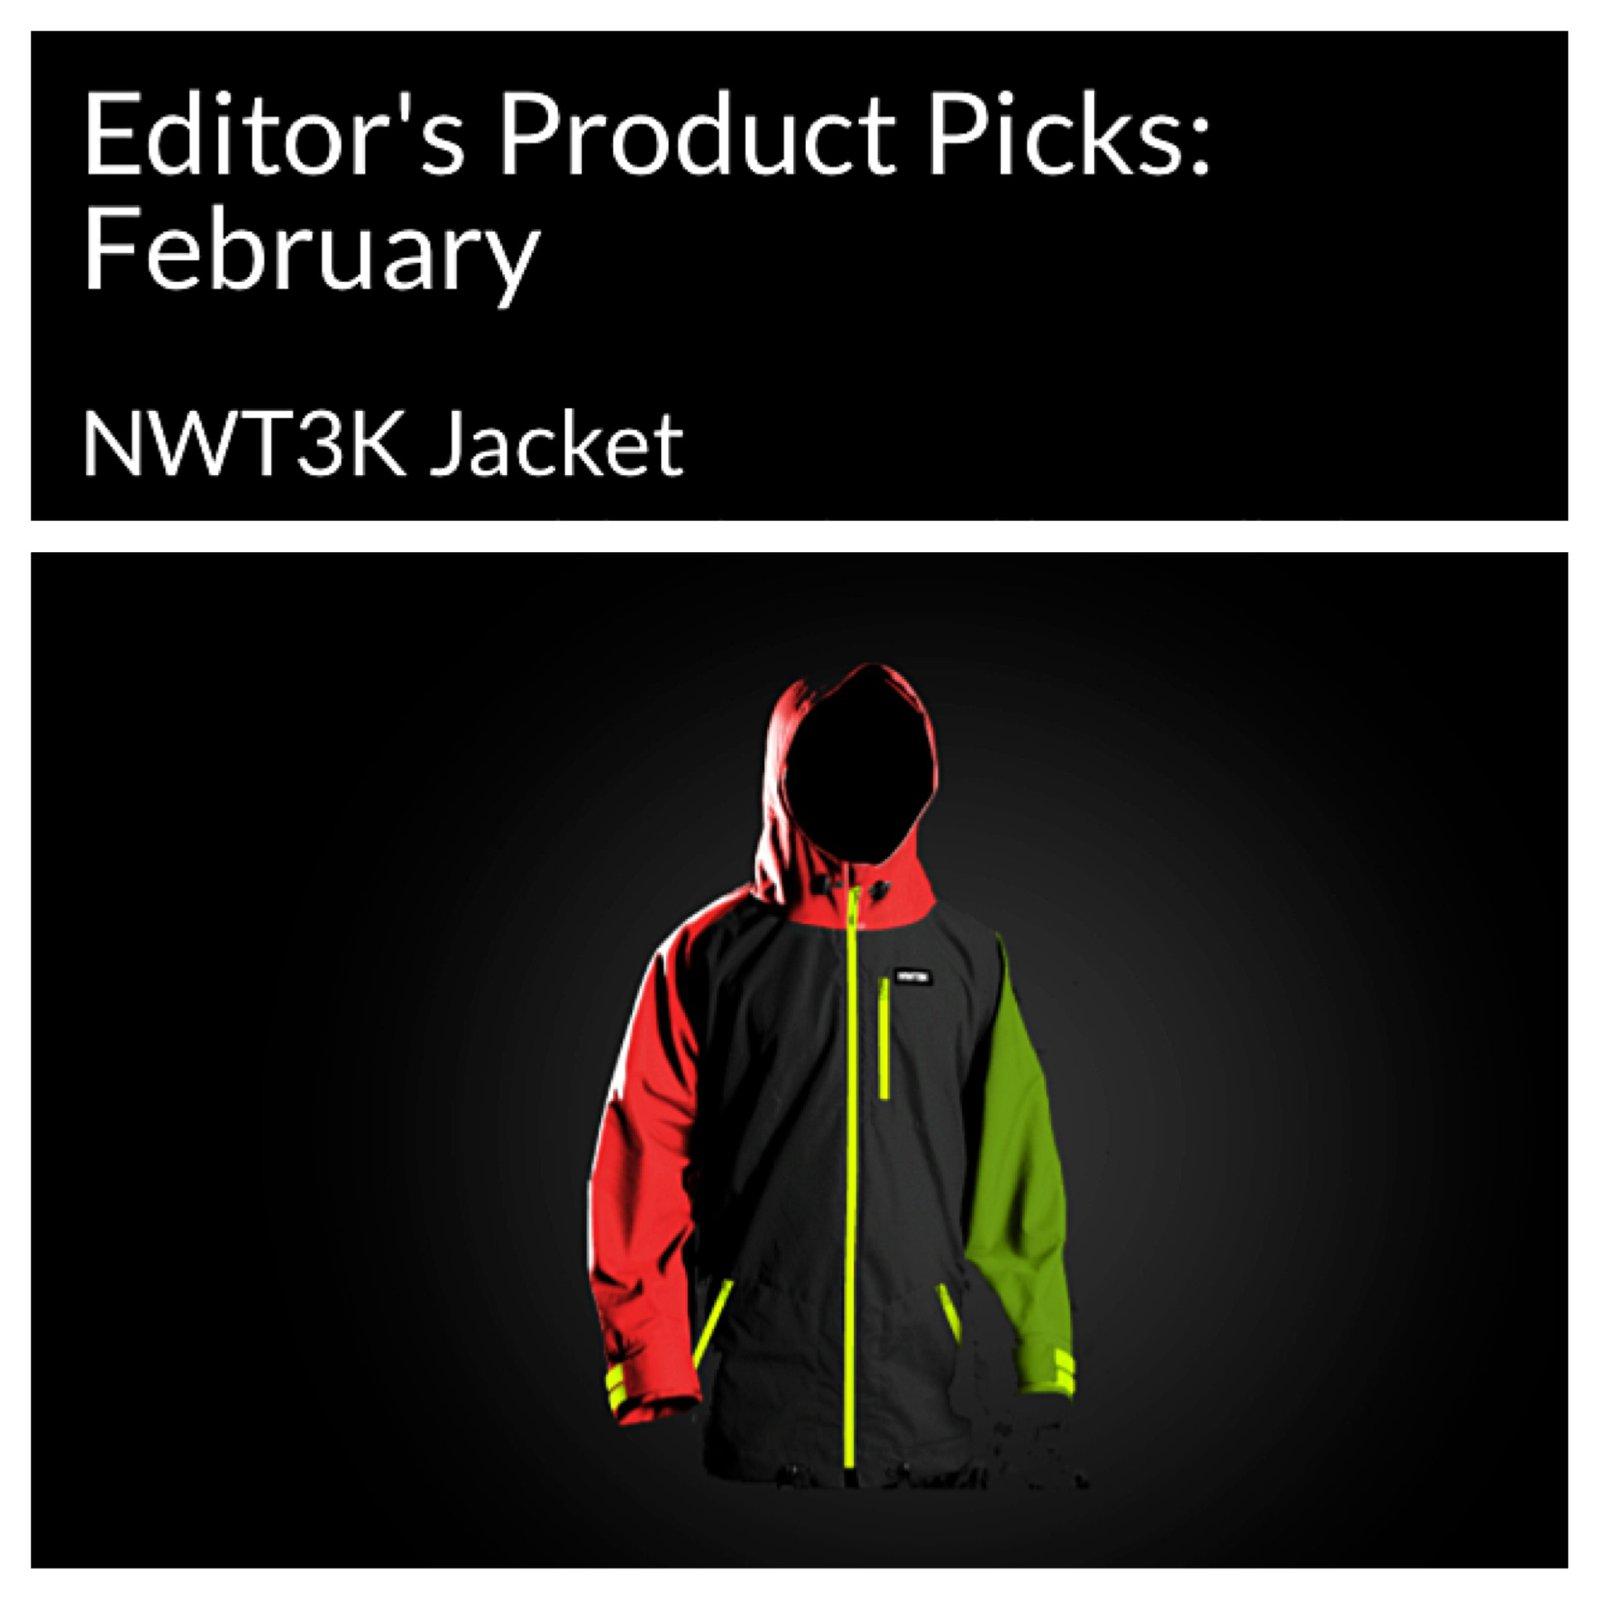 Skiing Magazine Feb. Product Pick